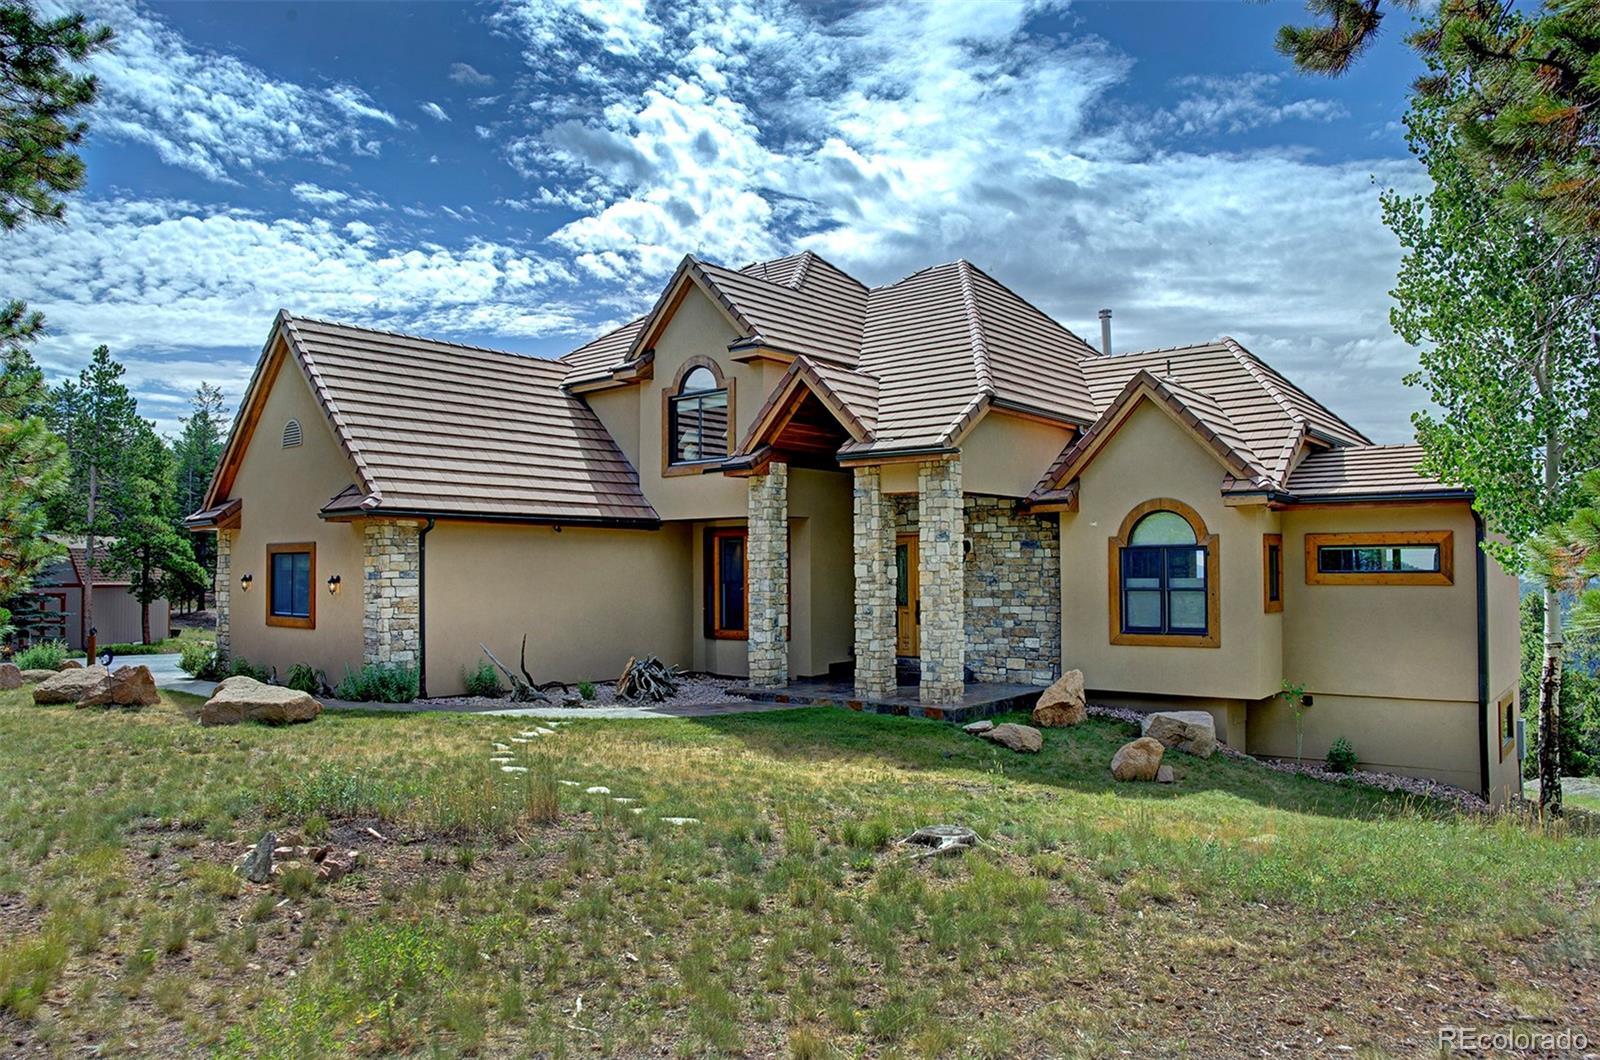 MLS# 9731389 - 2 - 28237 Belle Vista Drive, Conifer, CO 80433